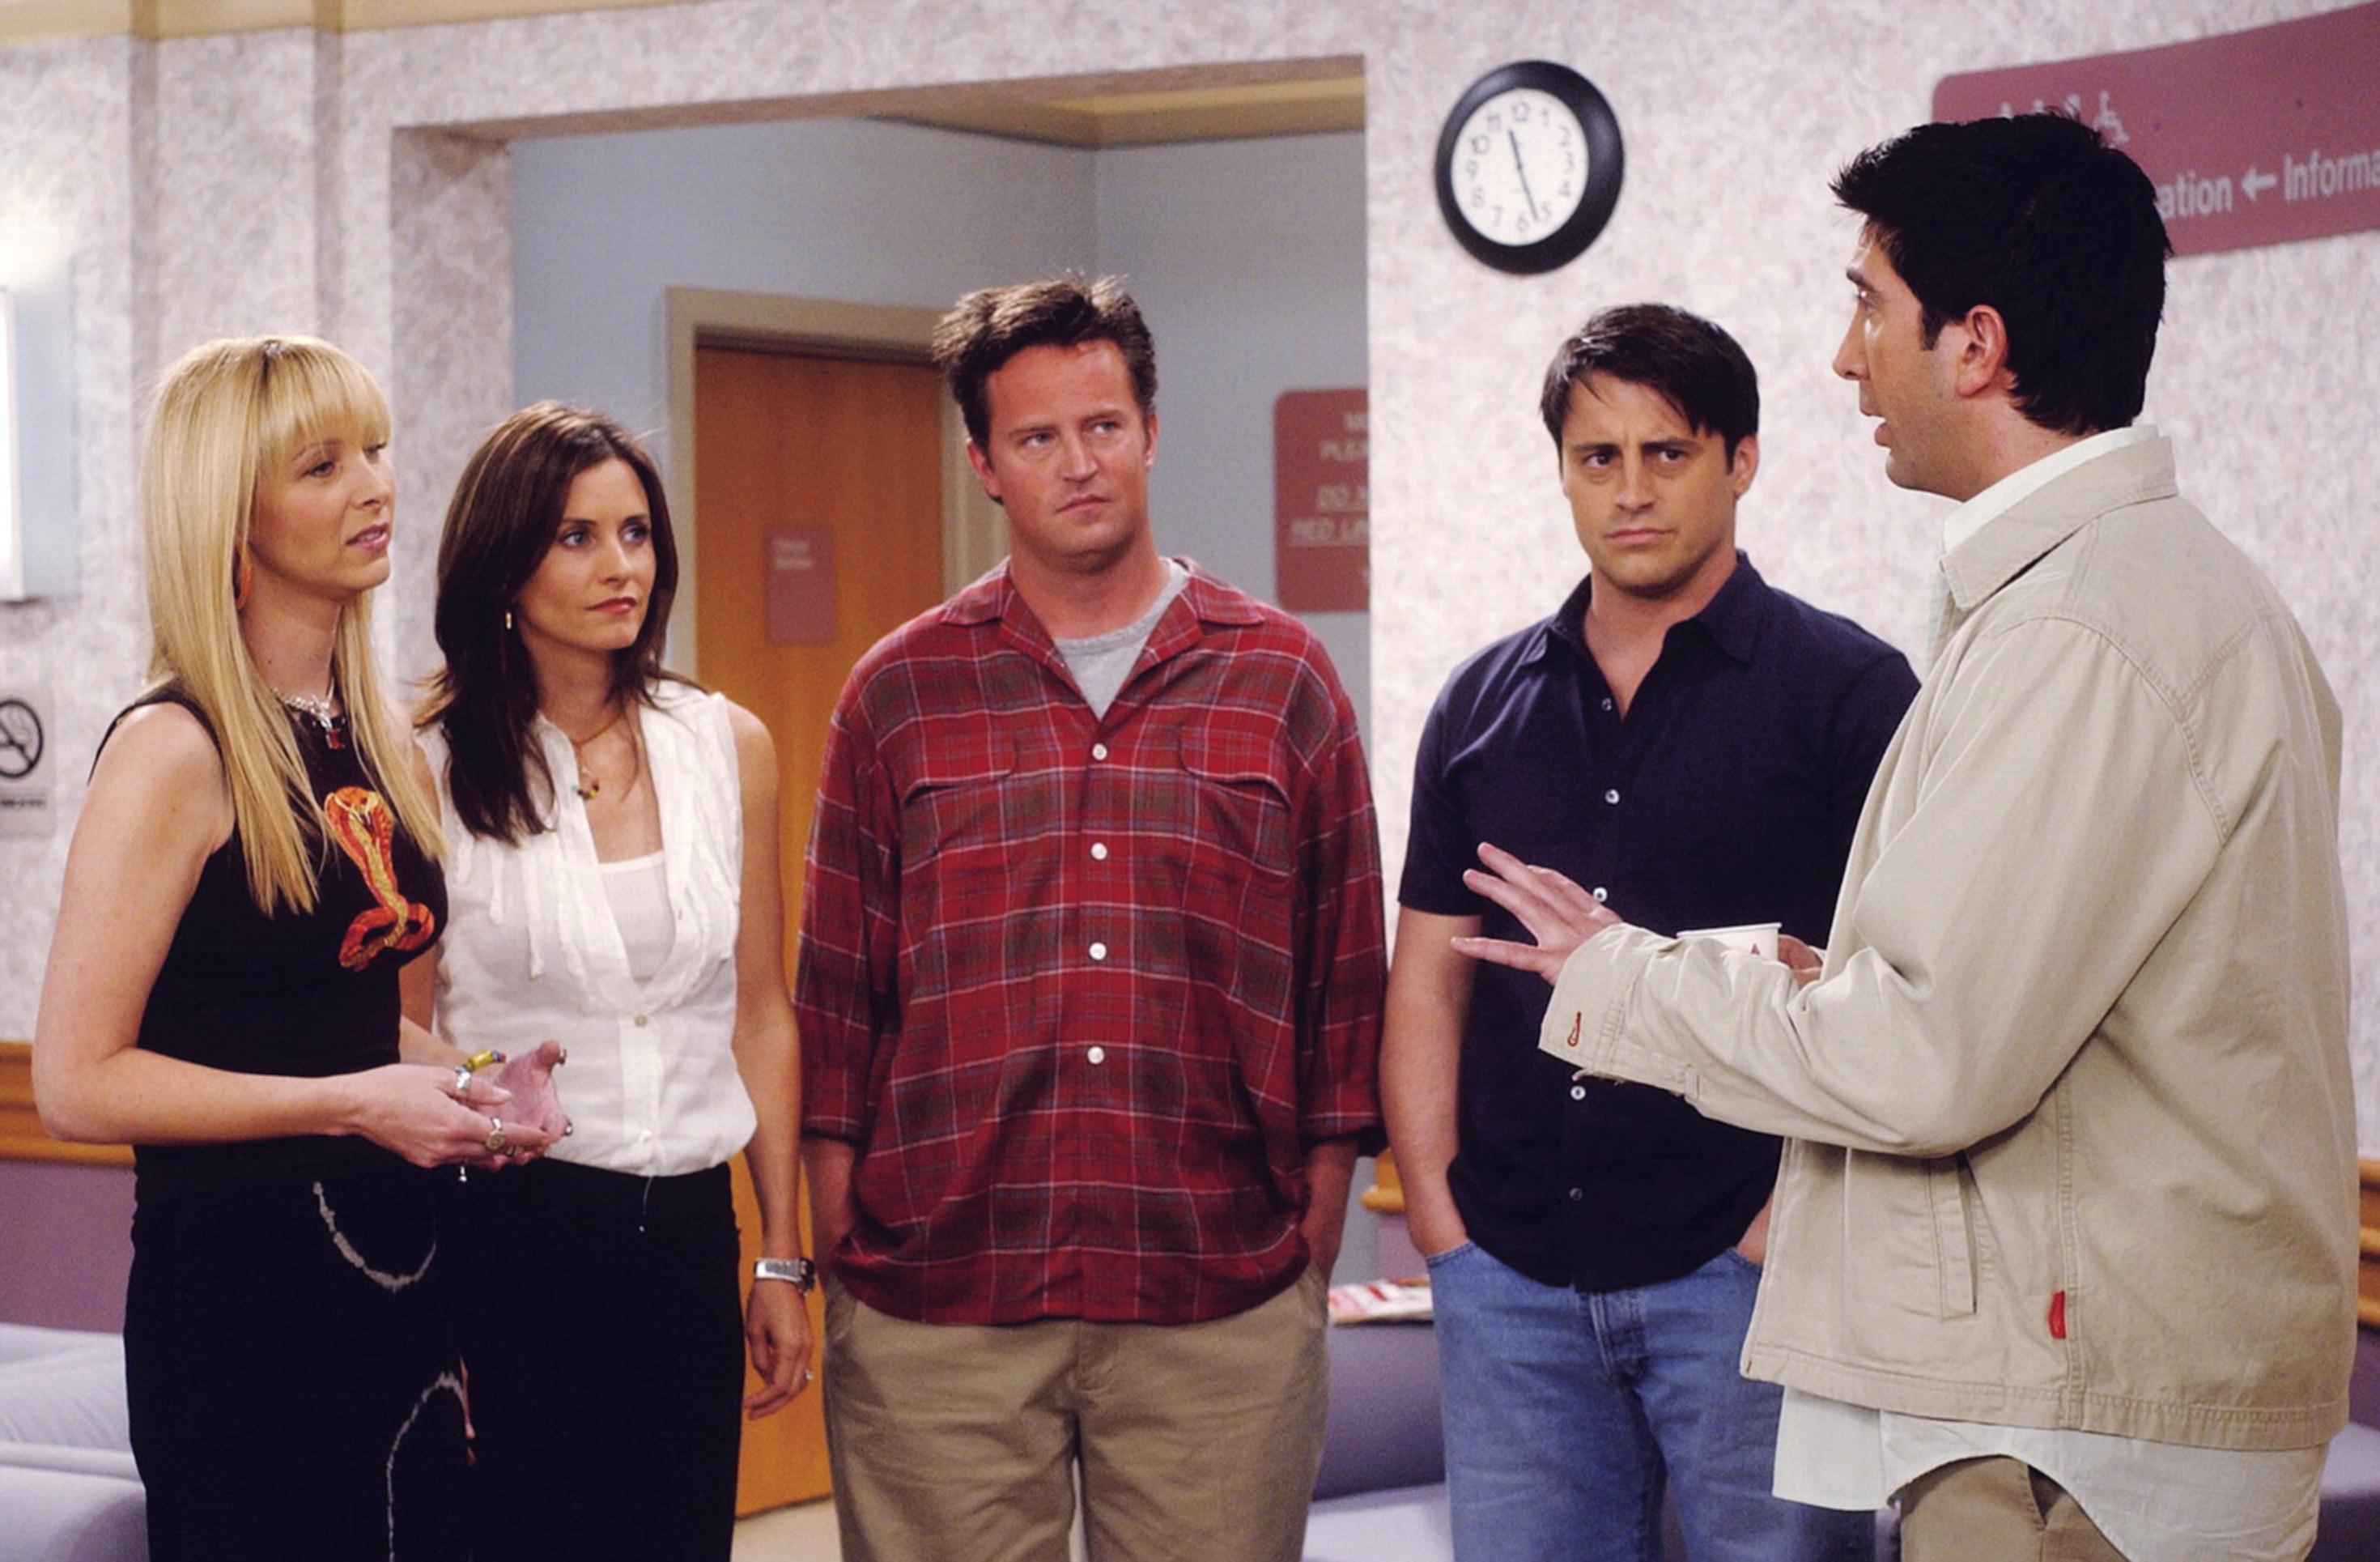 Lisa Kudrow, Courteney Cox Arquette, Matthew Perry, Matt LeBlanc, David Schwimmer, 1994-2004